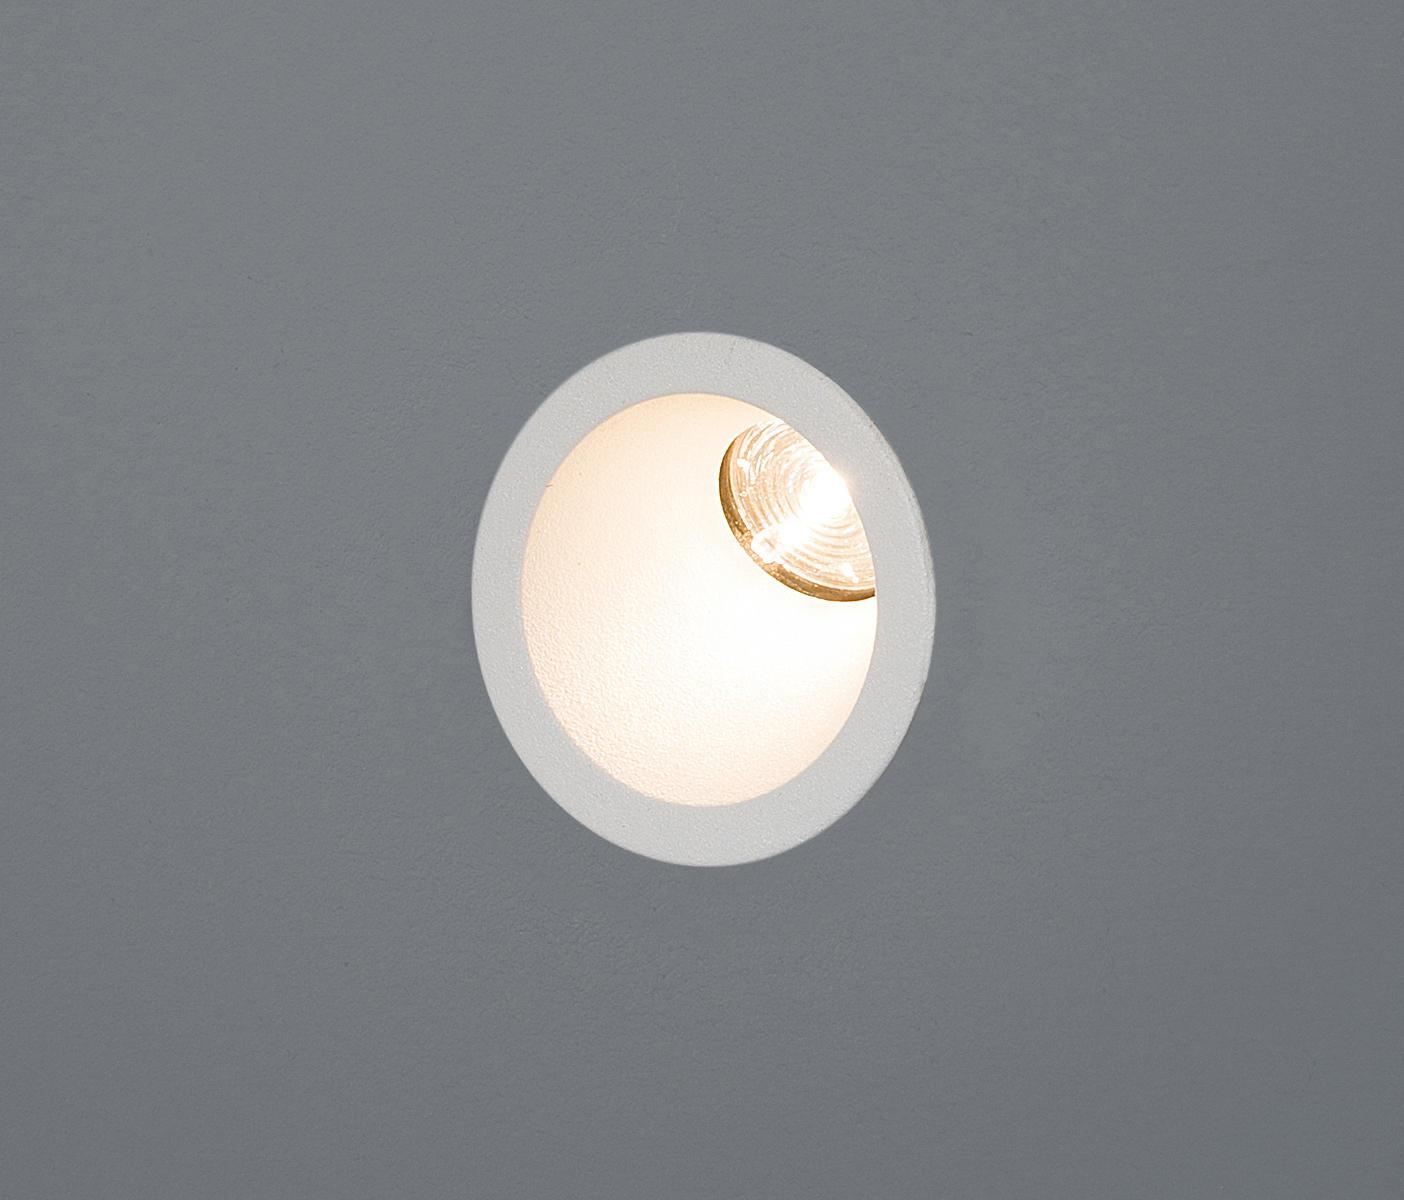 Asy Lotis 48 Ip55 Led Ge Spotlights From Modular